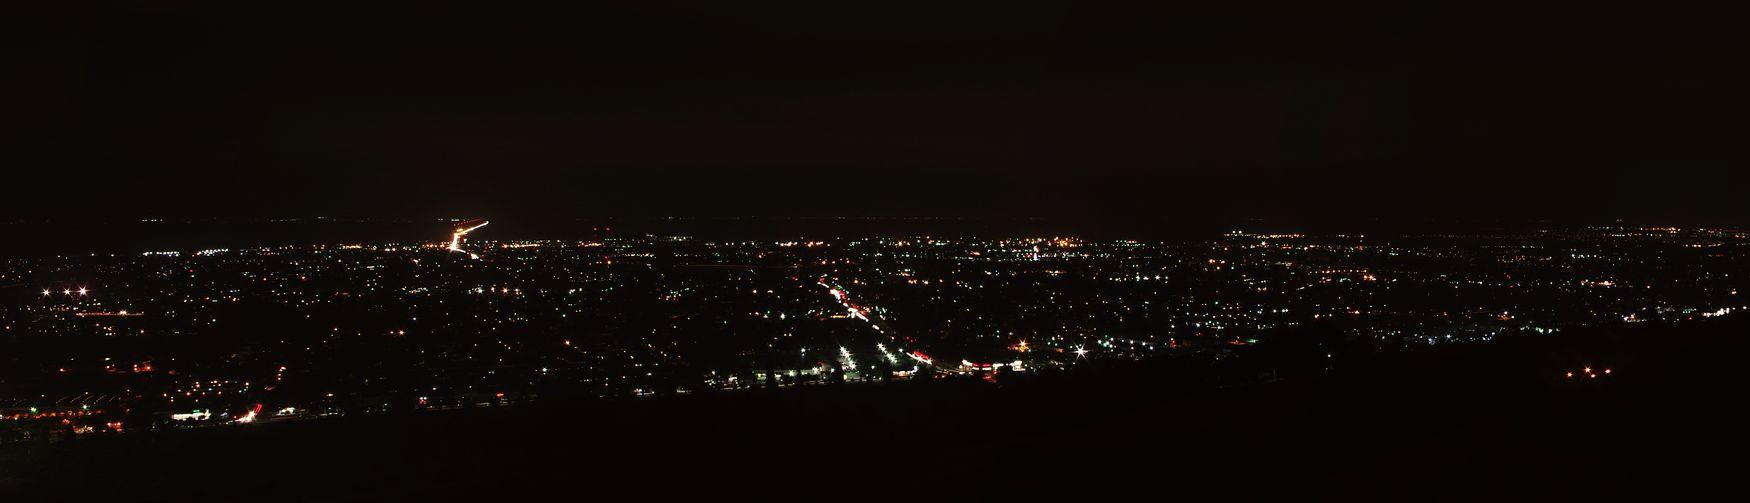 Panorama Hayward Nightphotography City Lights Bay Area California